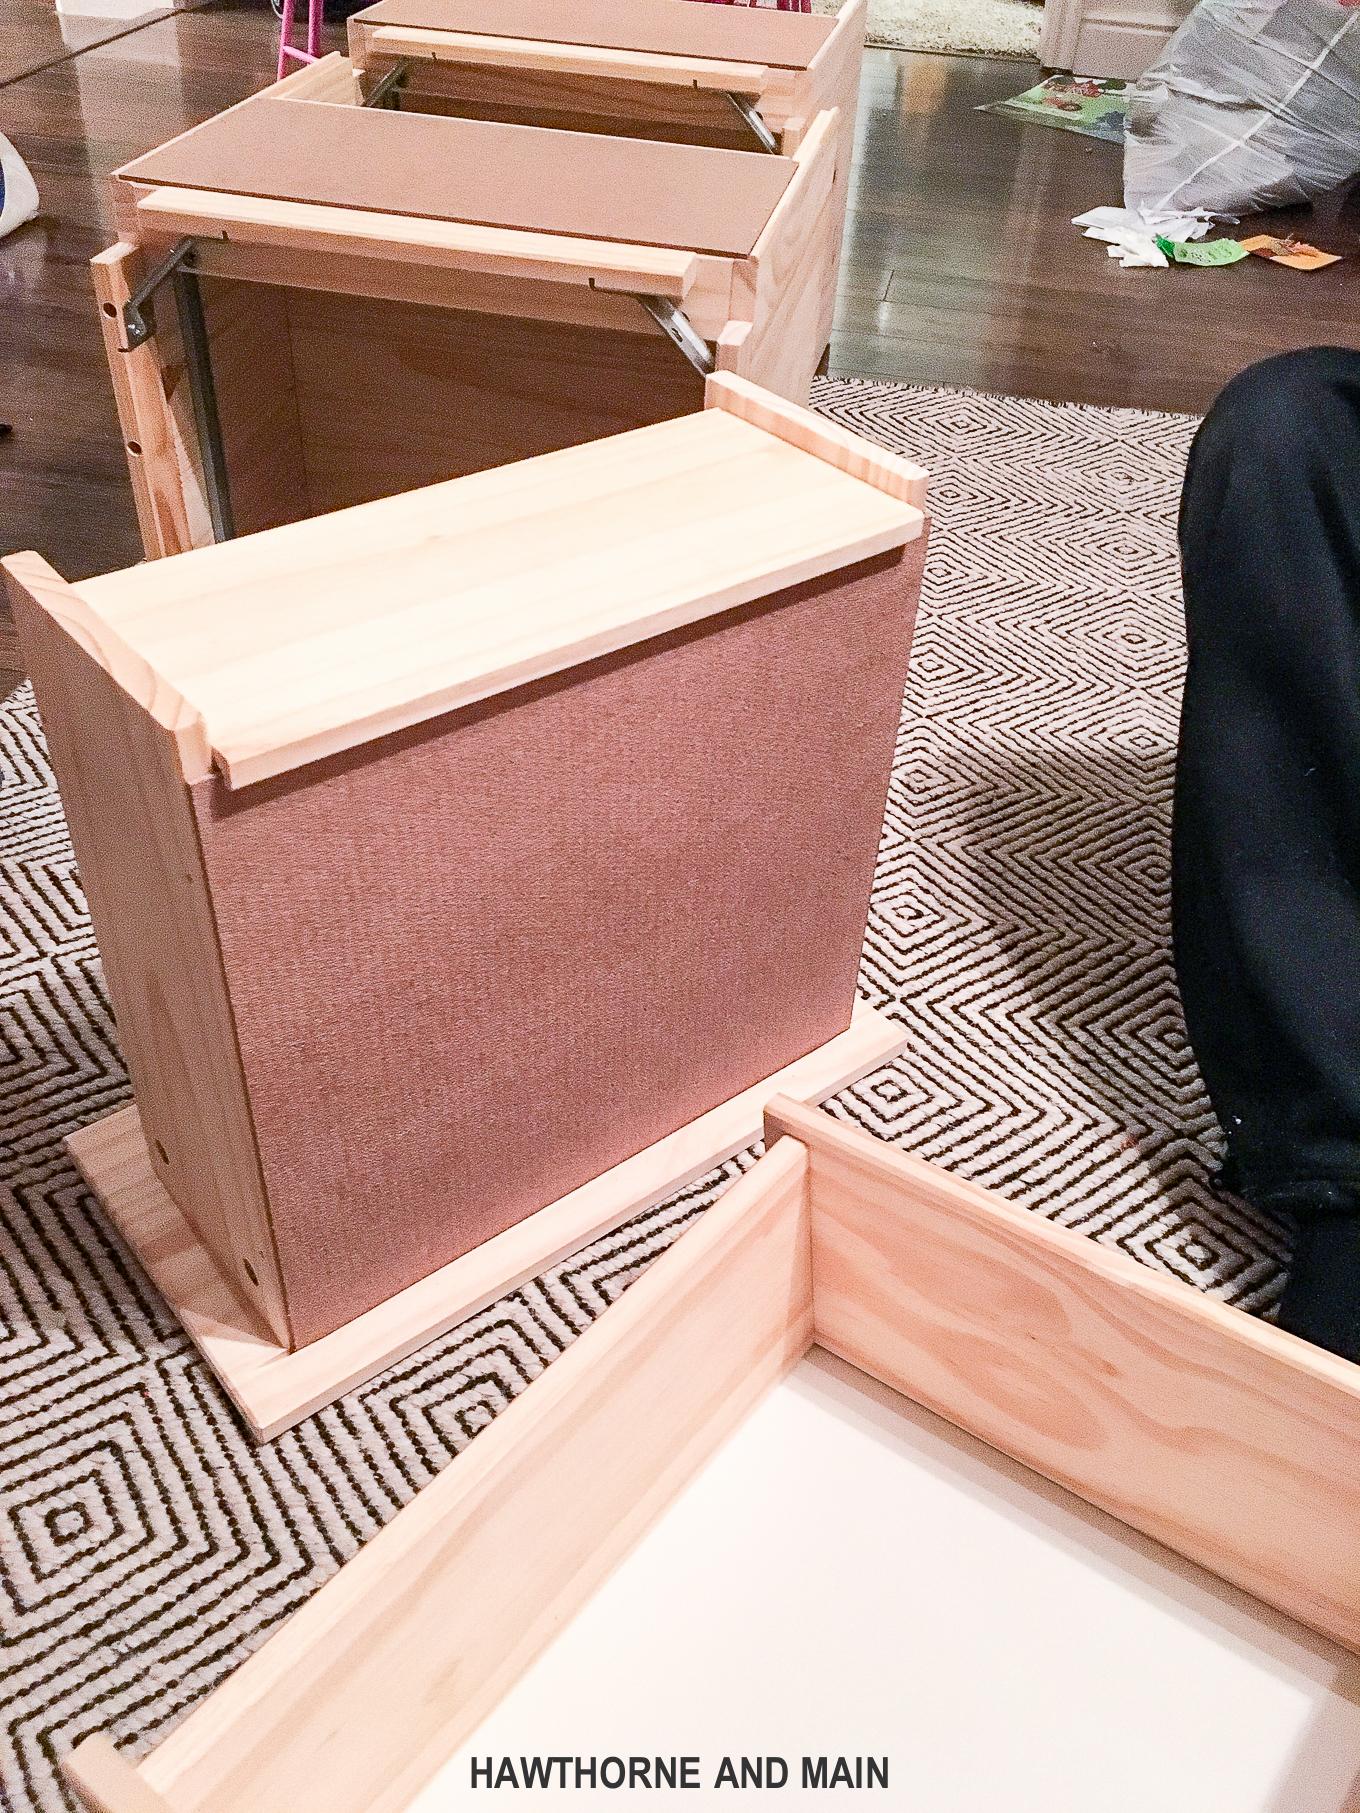 assemble-ikea-larva-nightstand-